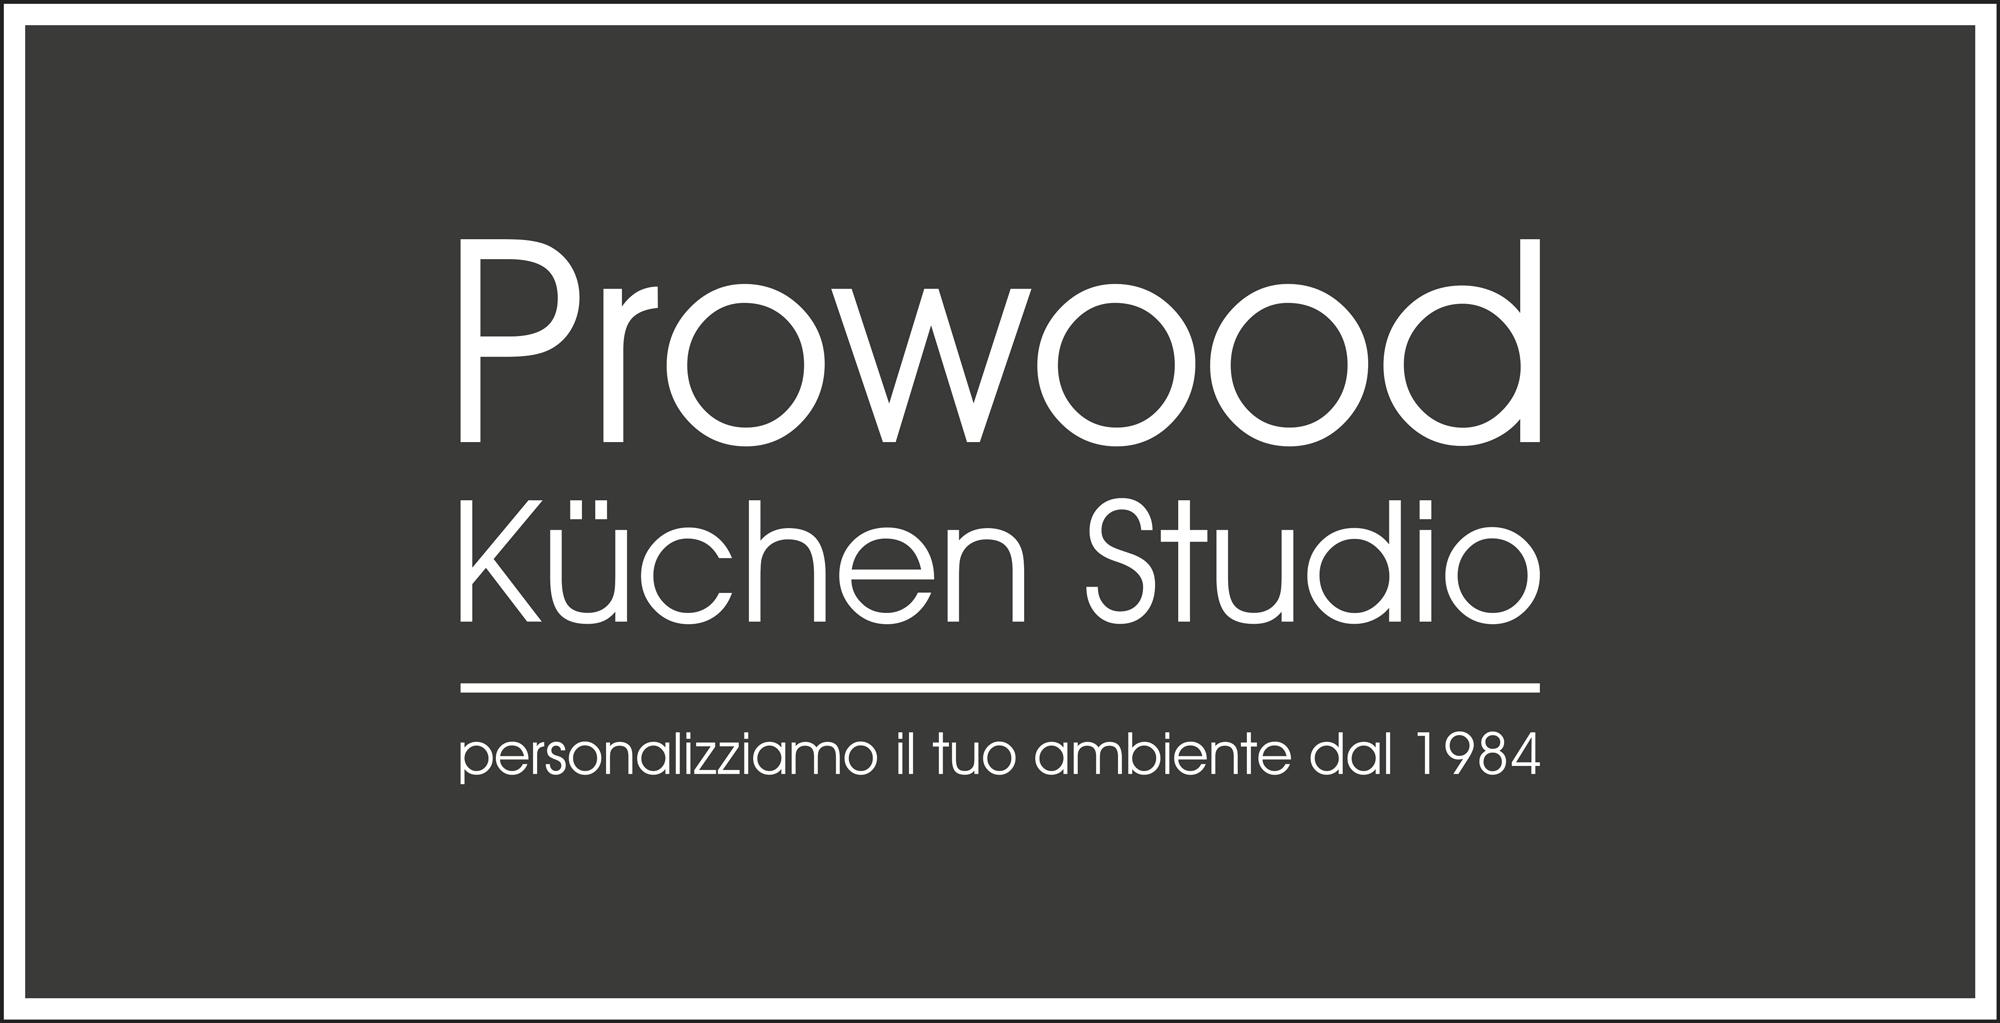 Marchio Prowood